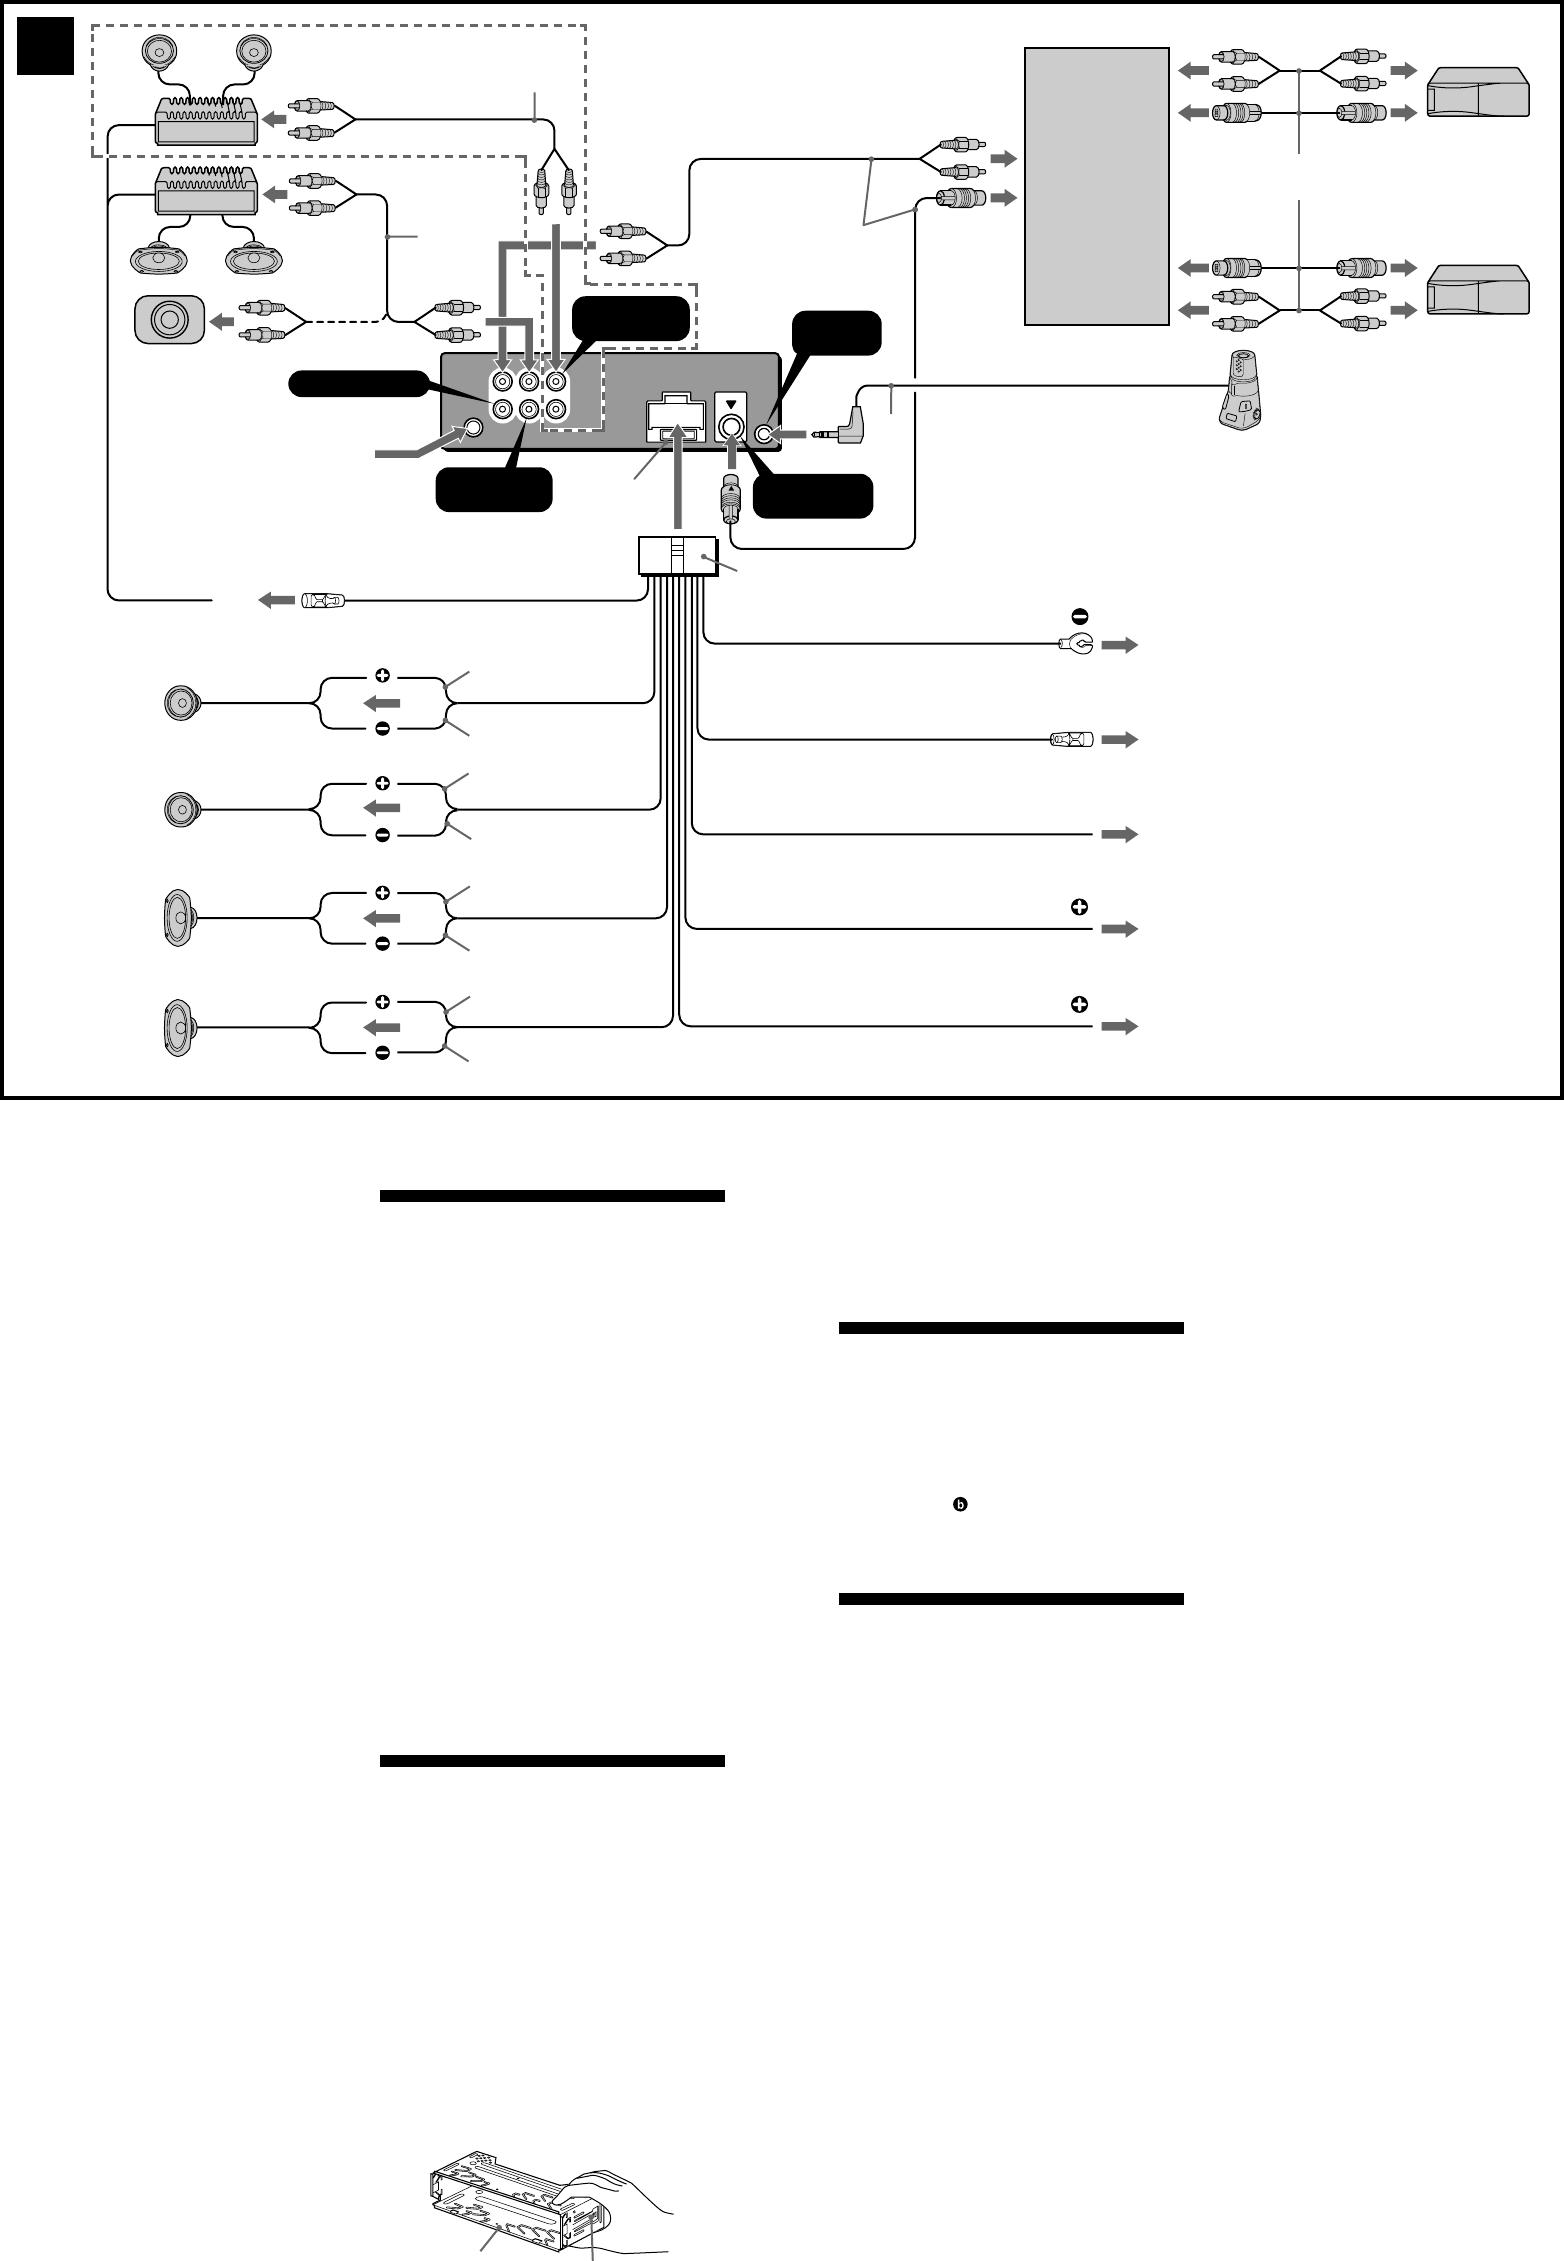 Sony Xplod Cdx F Wiring Diagram